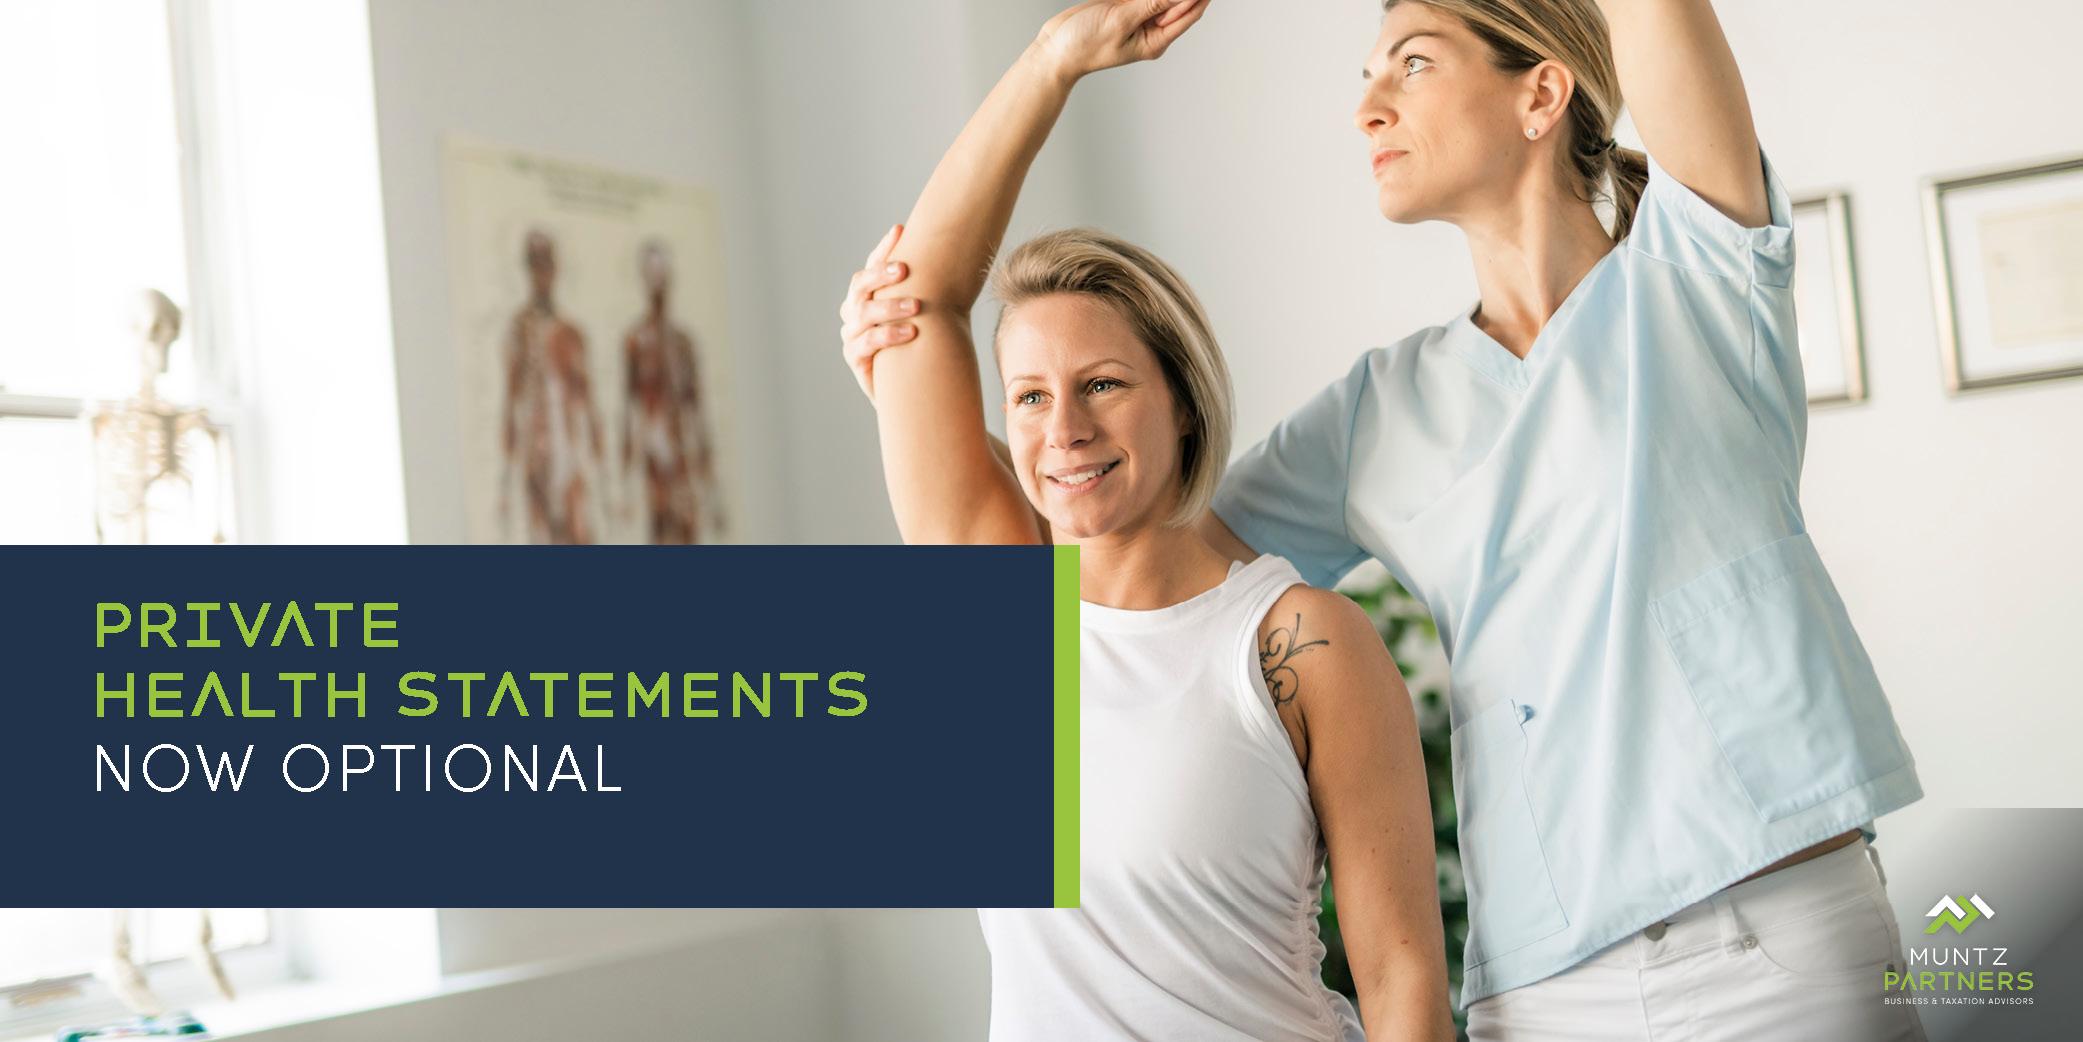 Private health insurance statements now optional - Muntz Partners